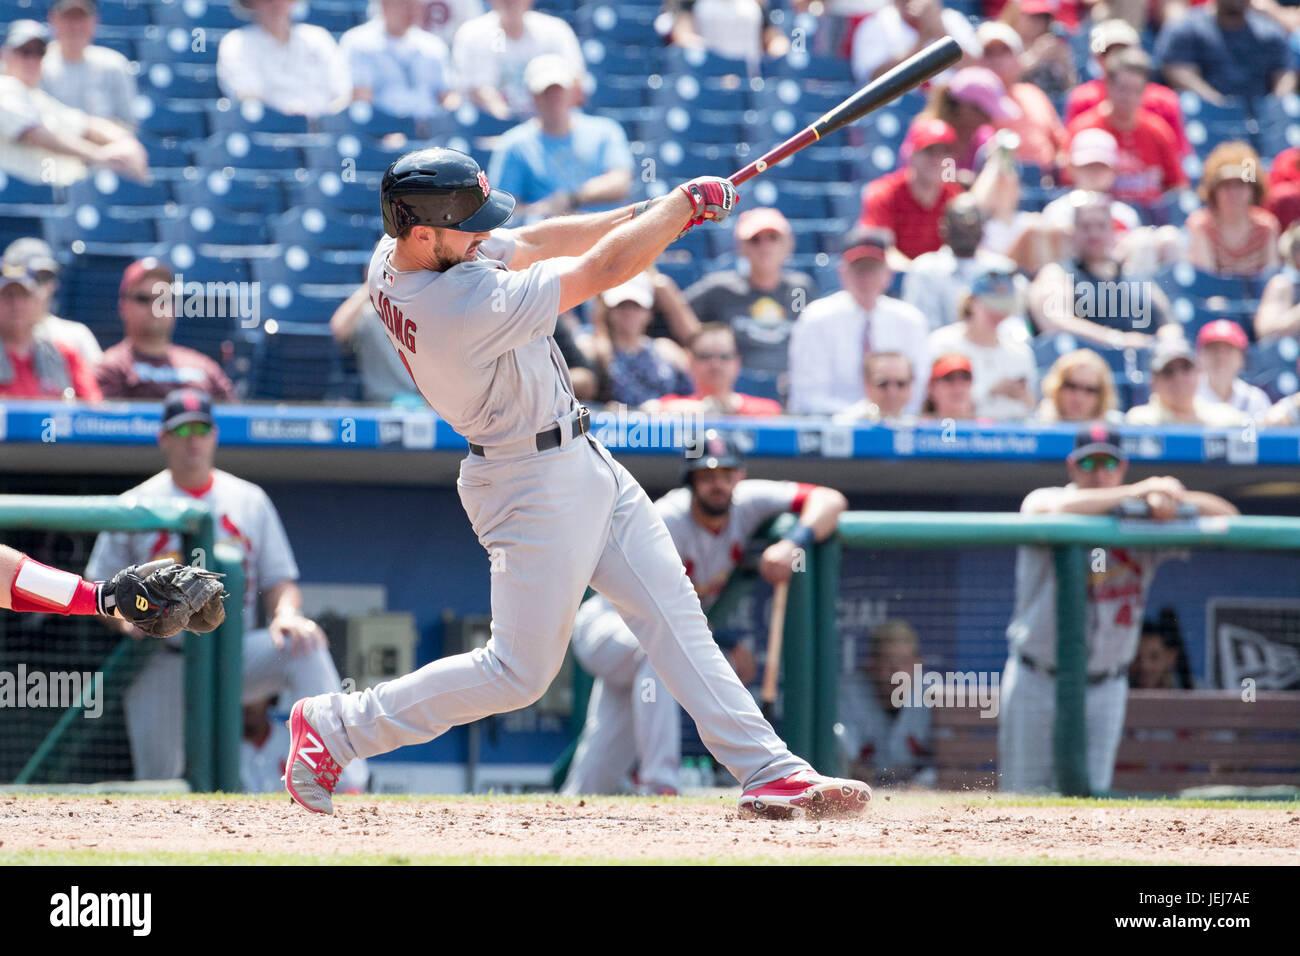 Philadelphia, Pennsylvania, USA. 22nd June, 2017. St. Louis Cardinals second baseman Paul DeJong (11) hits a home - Stock Image